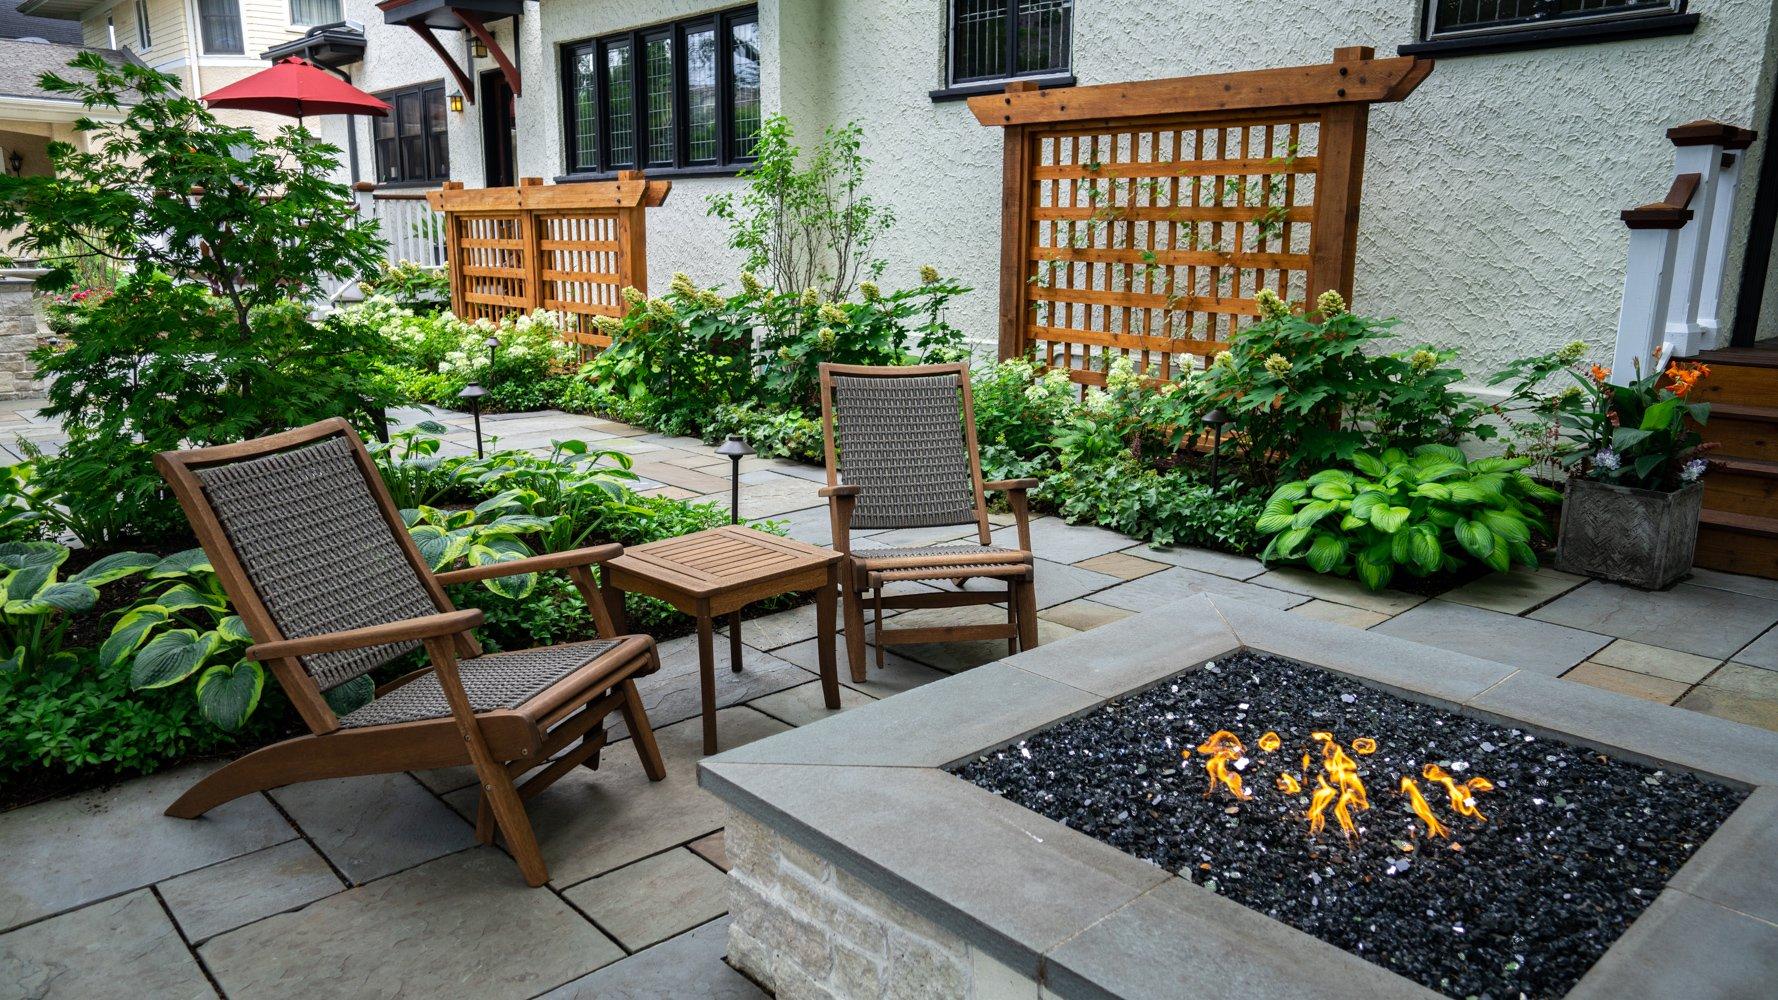 Fire feature on a bluestone patio